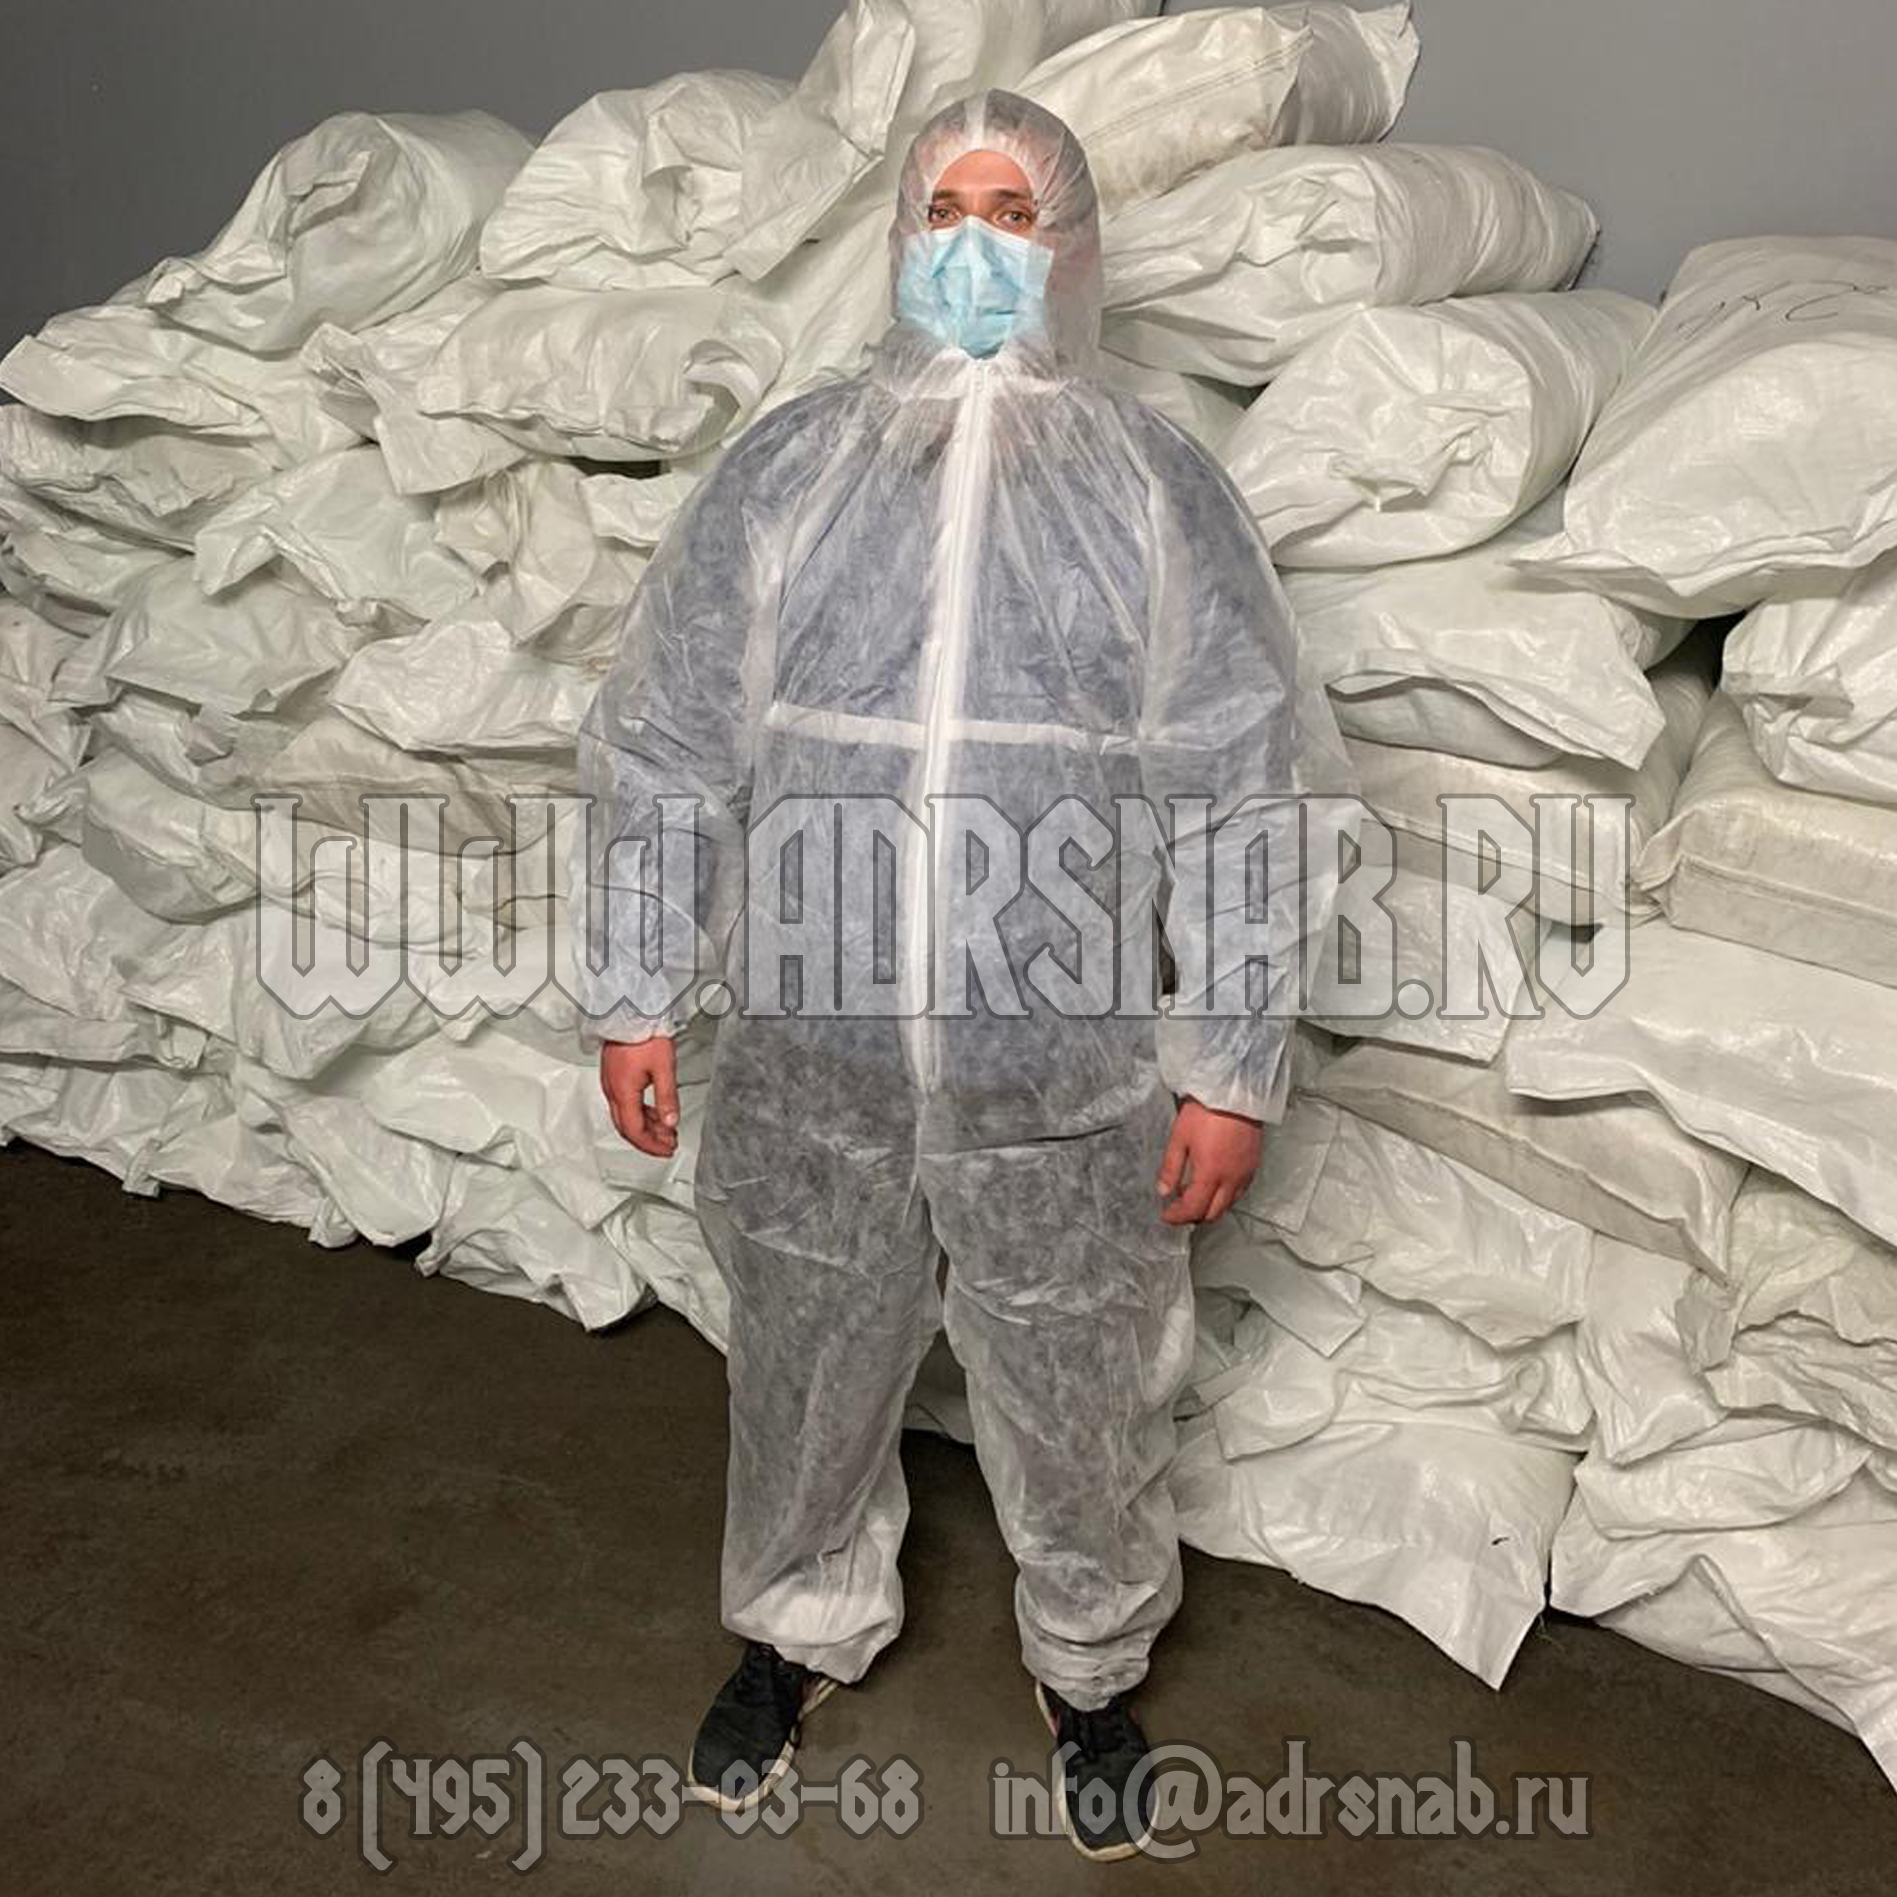 Комбинезон (костюм) защитный Каспер из спанбонда